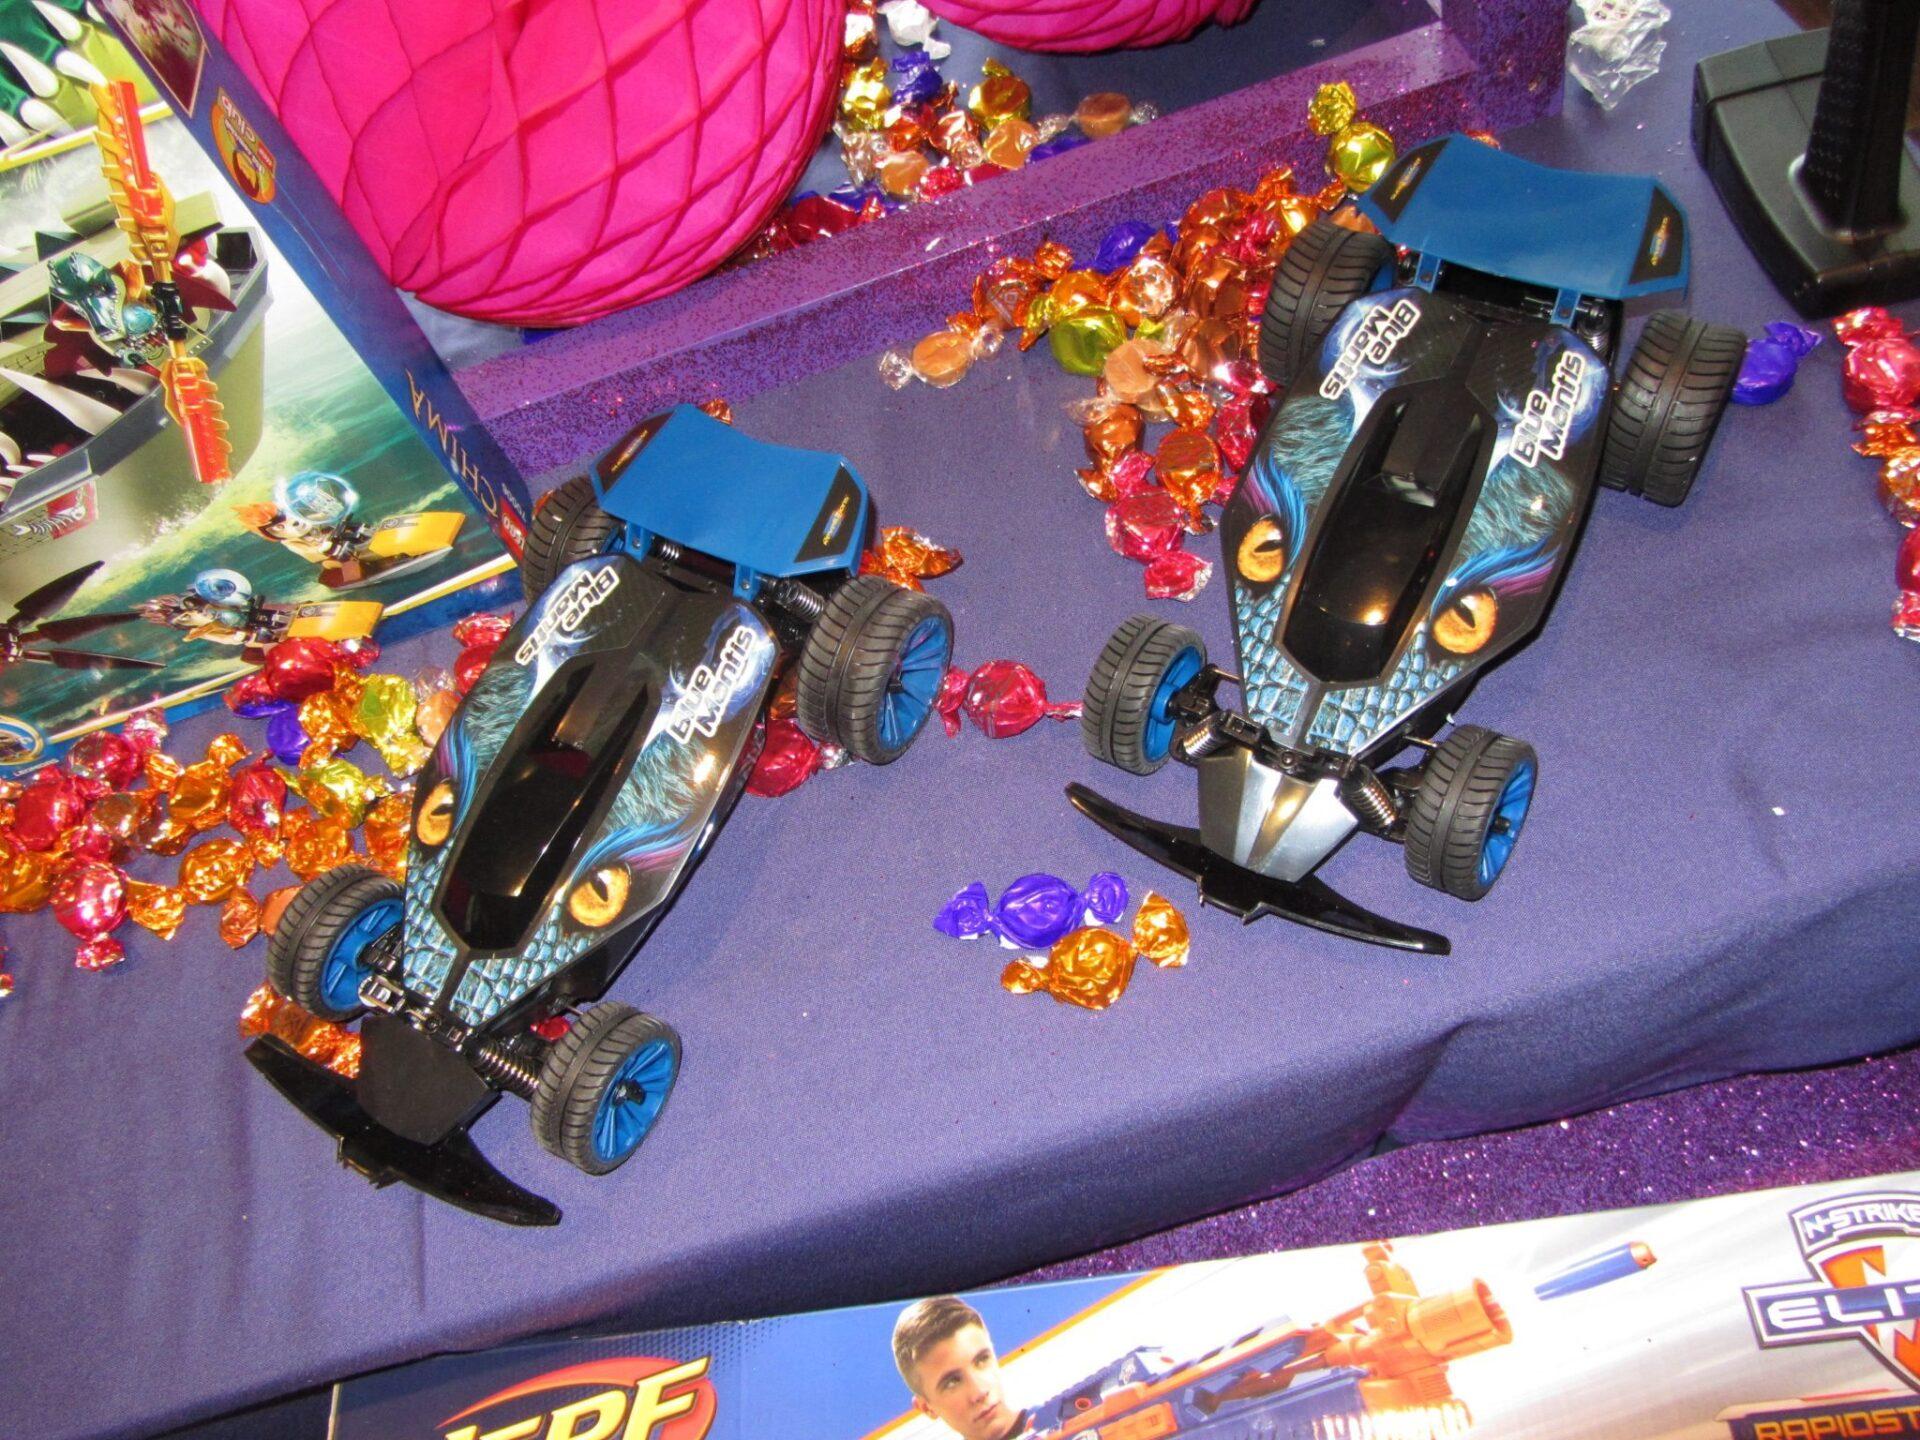 Xmas Gift Ideas for Men: Cars